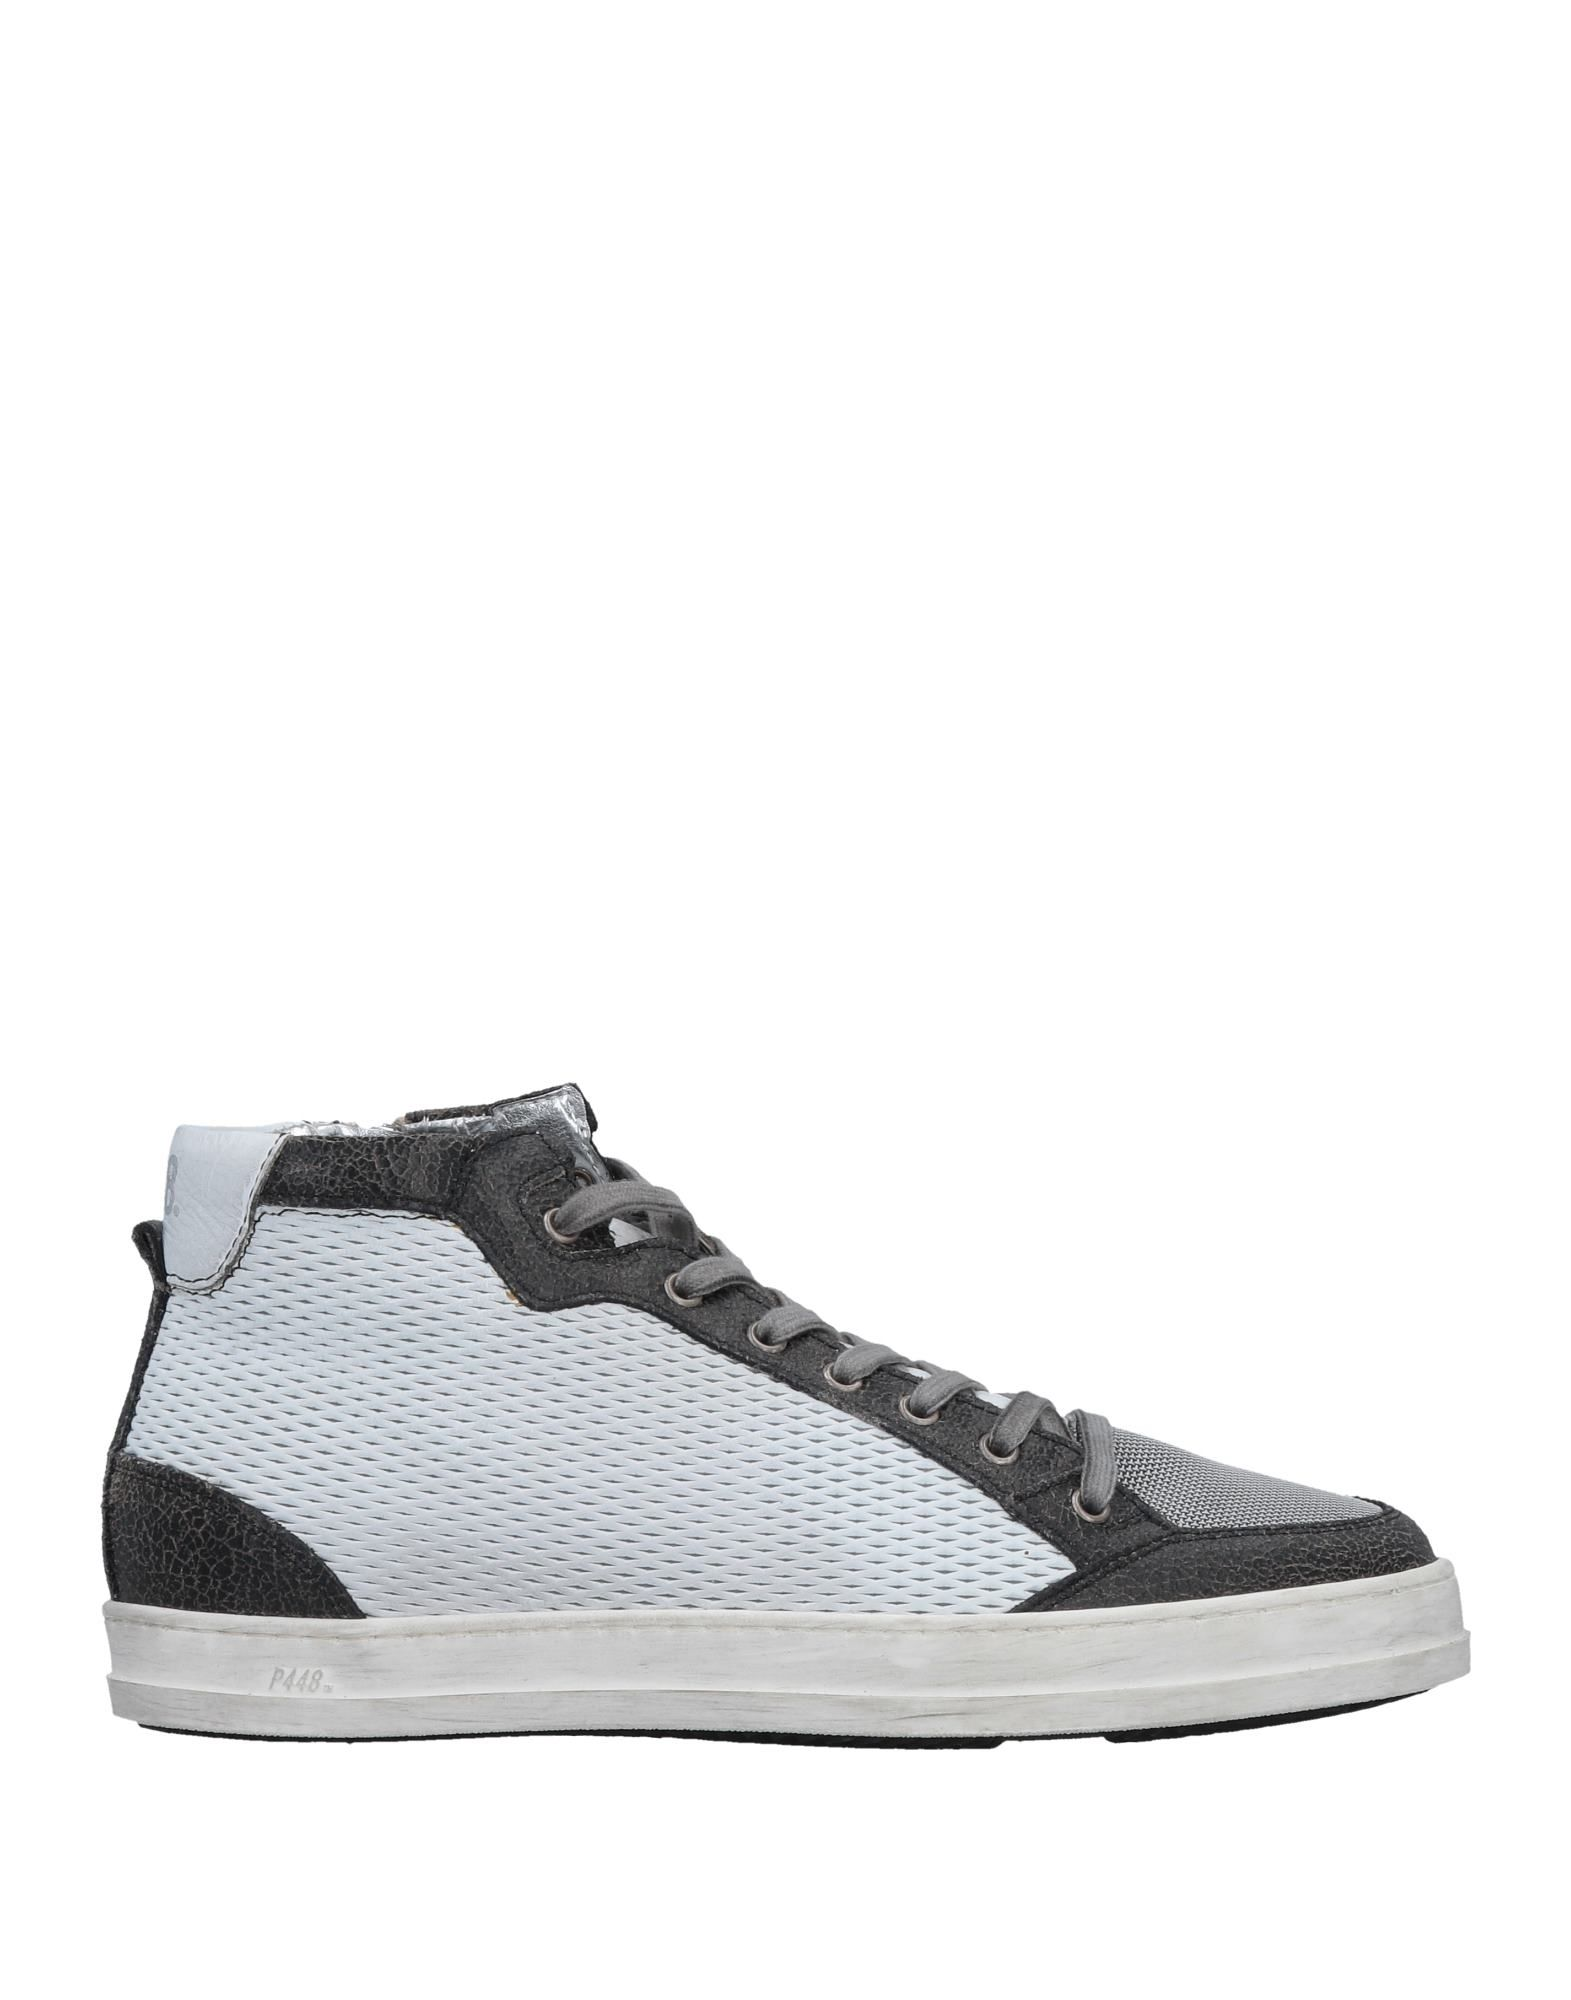 Moda Sneakers P448 Uomo - 11510425JP